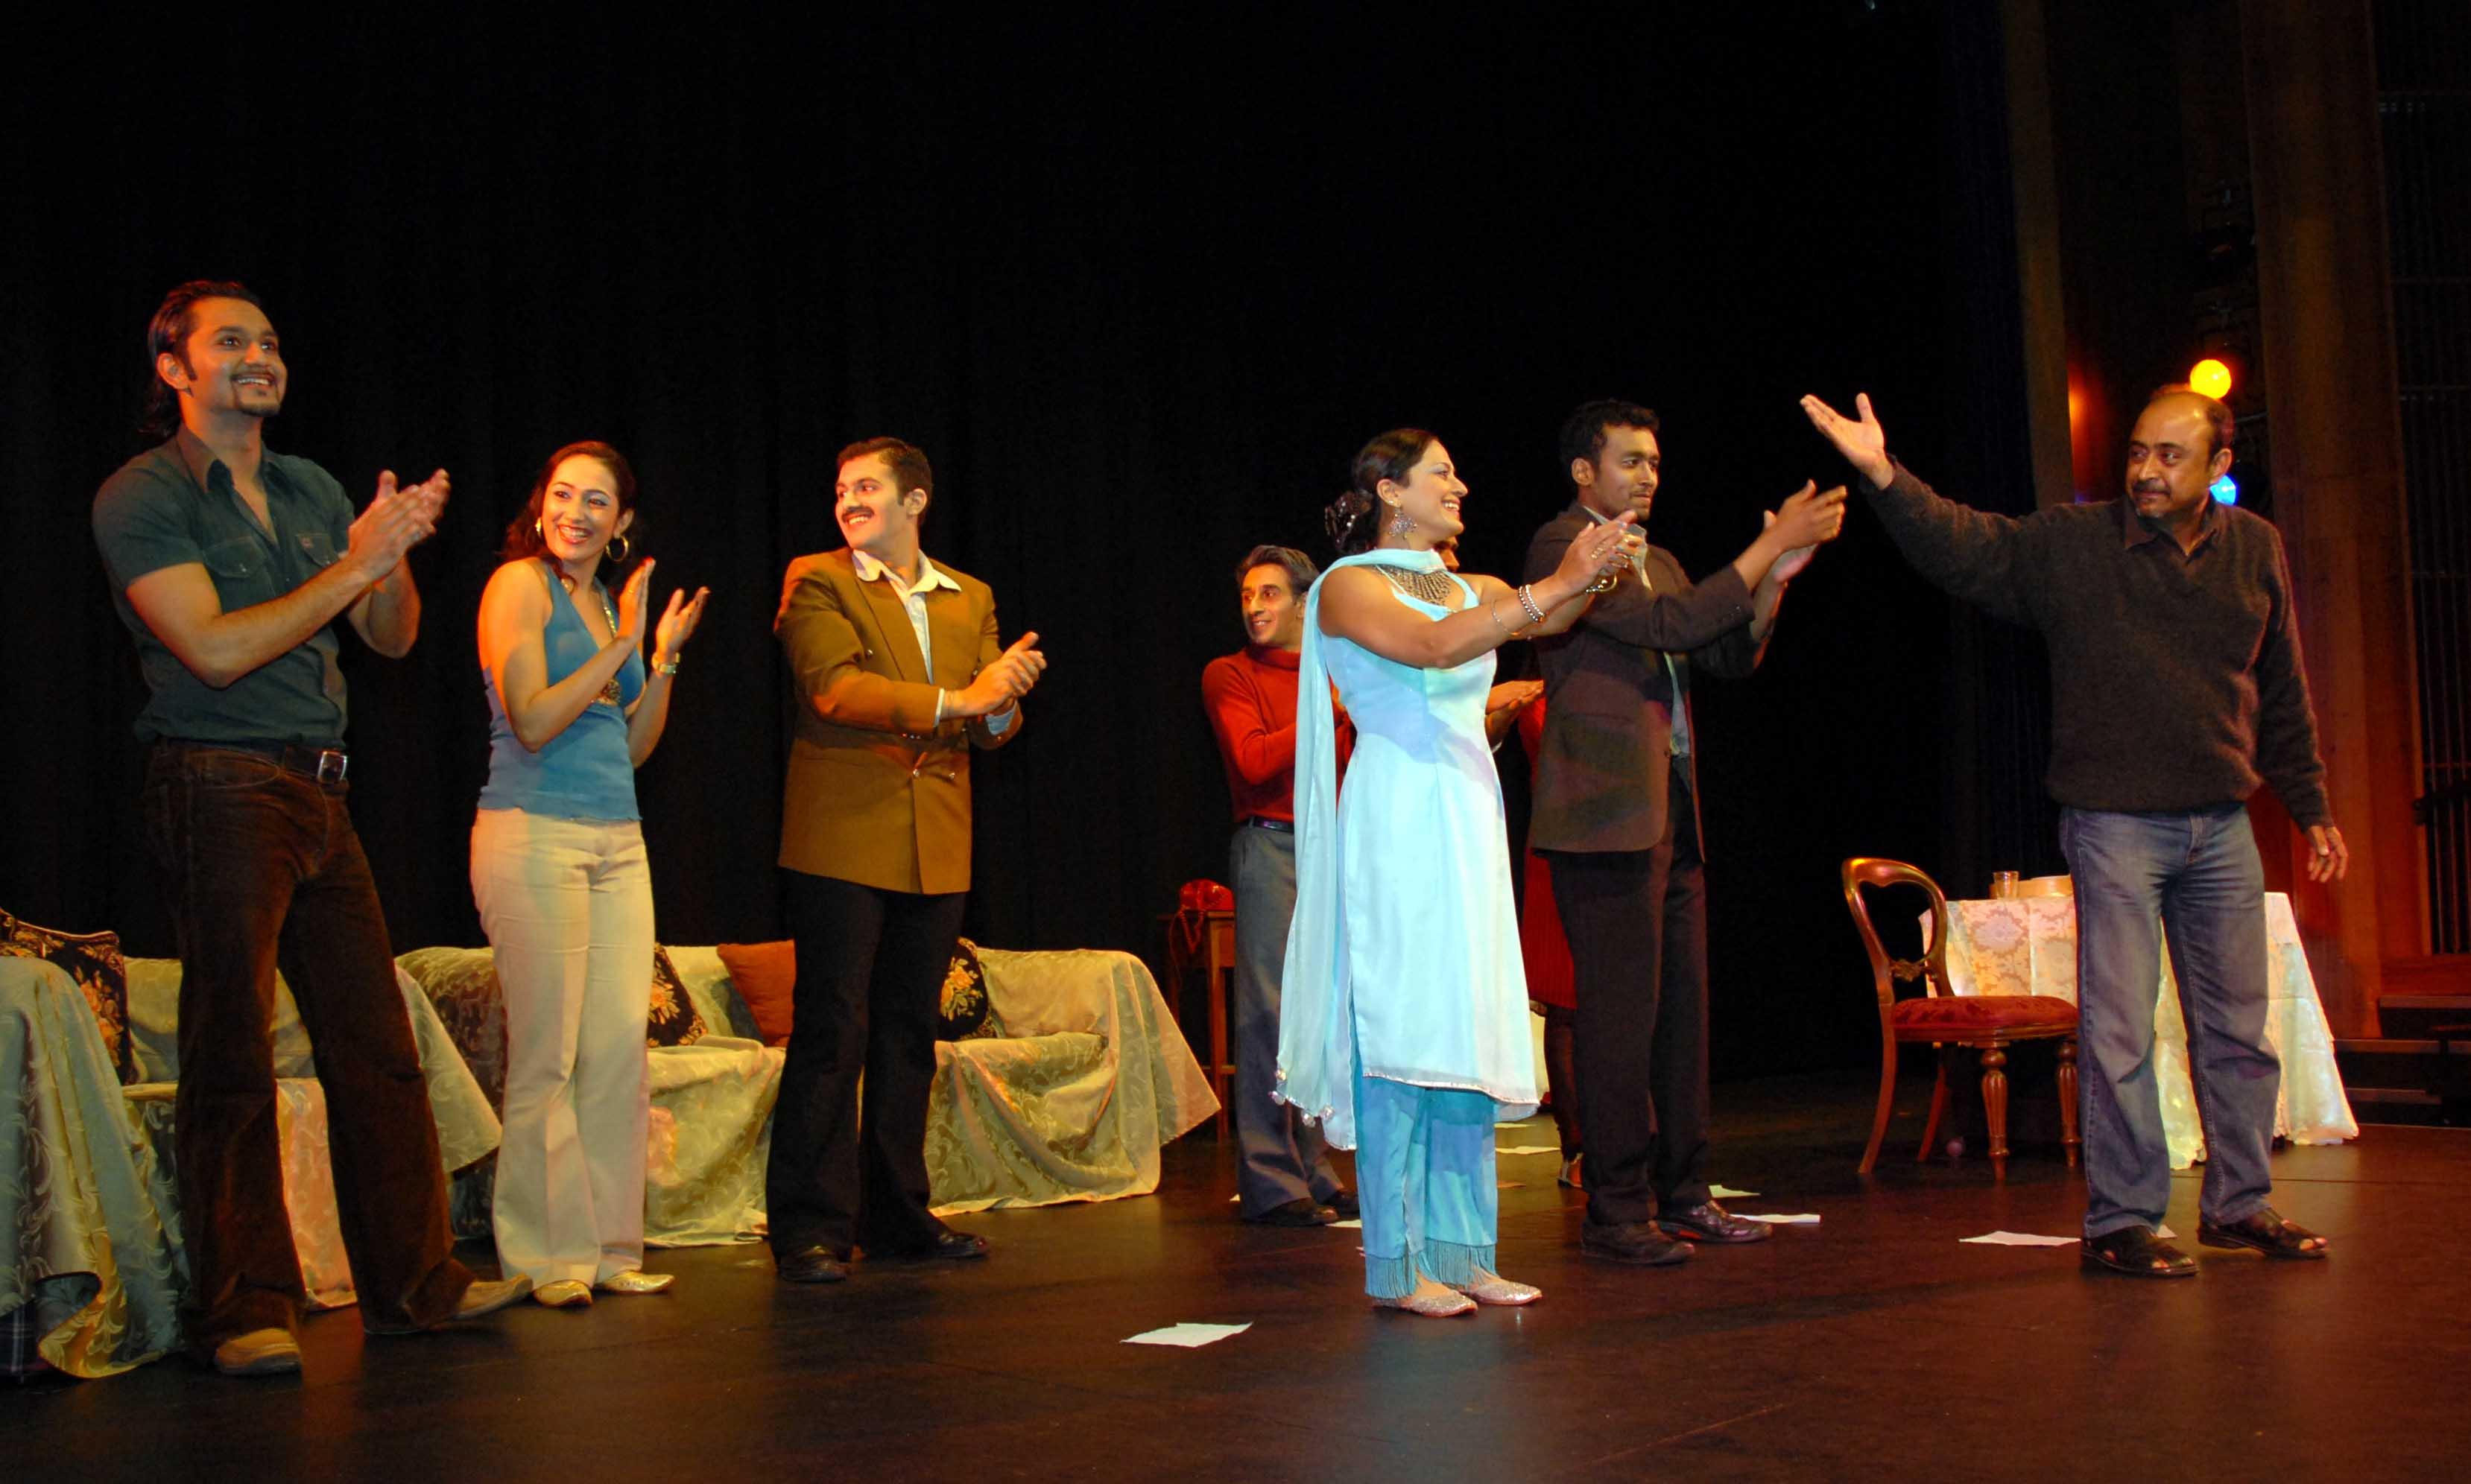 Dancers Stage Presence Stage Presence And Emotive